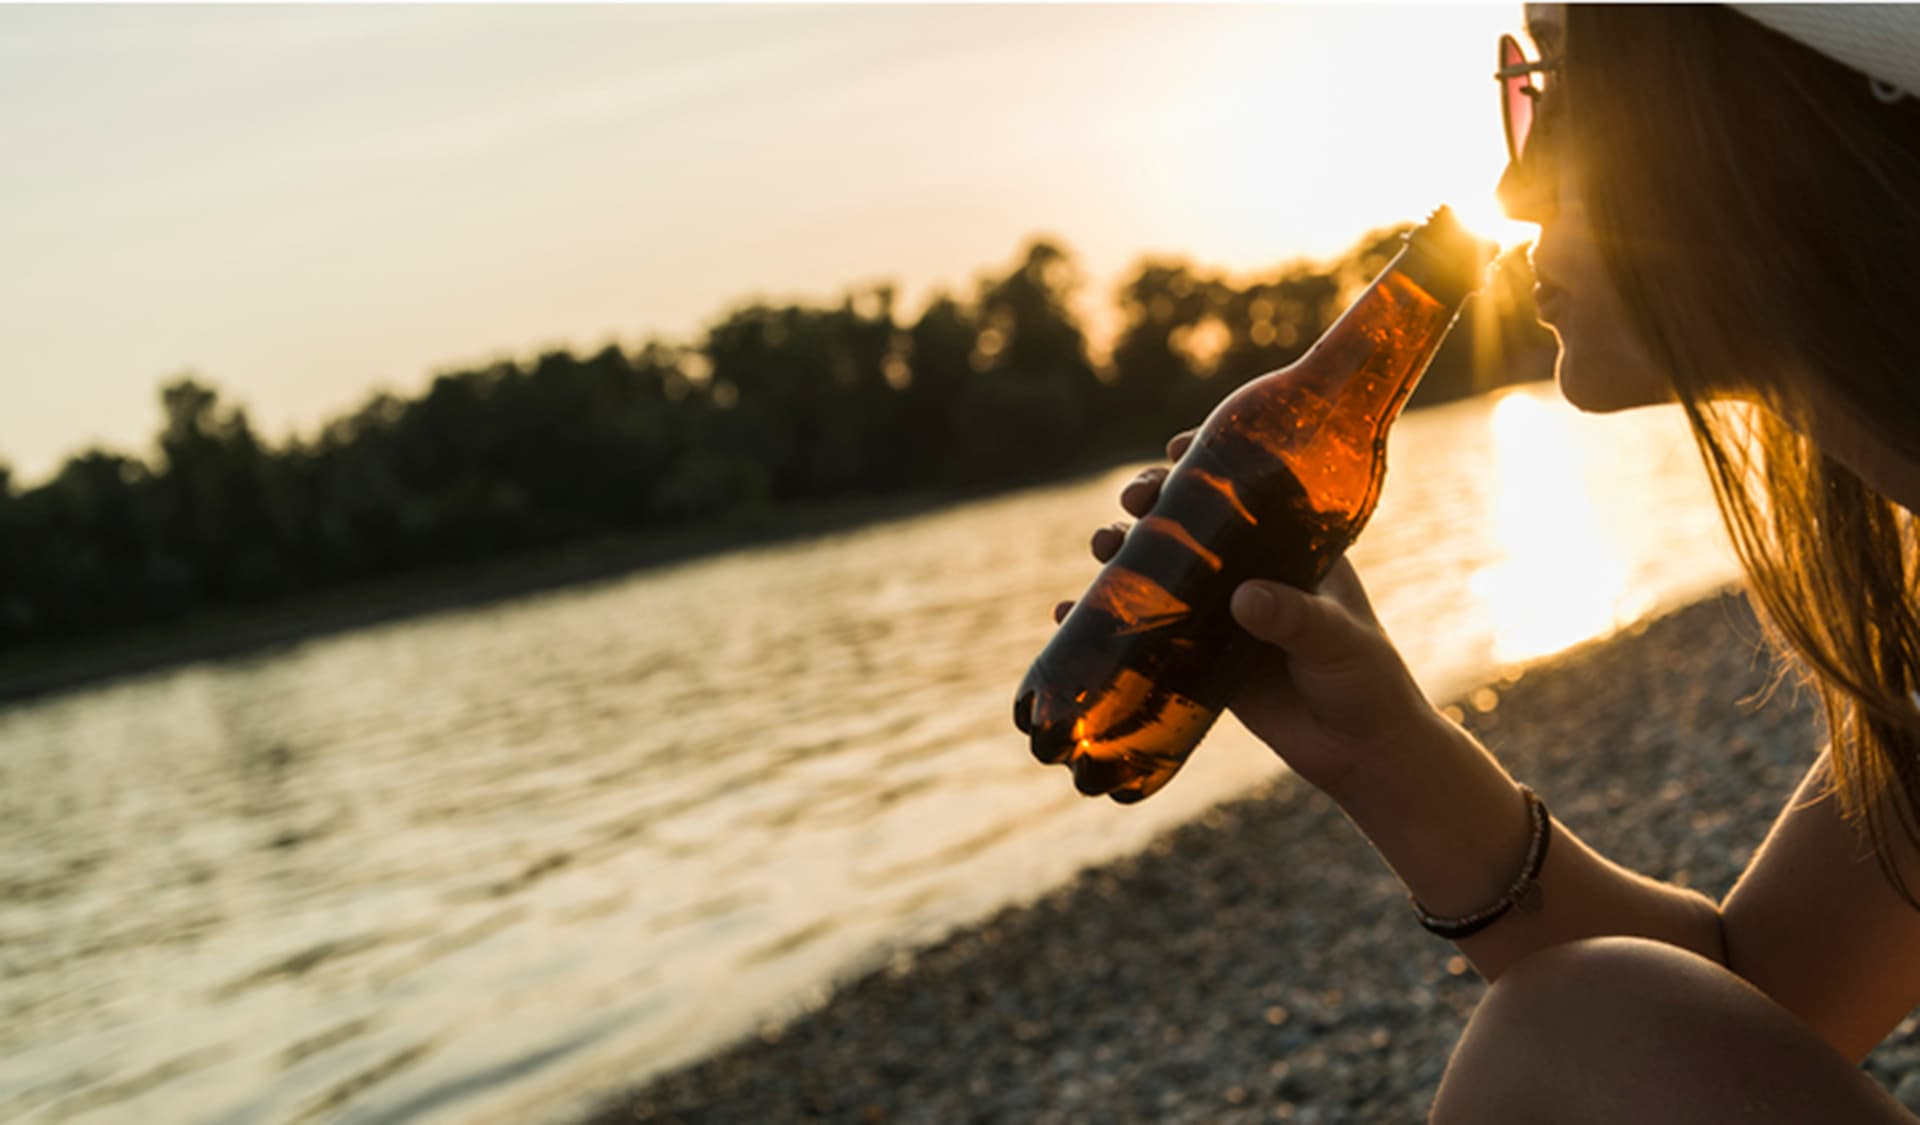 Eine Frau trinkt Malzbier bei Sonnenuntergang am See